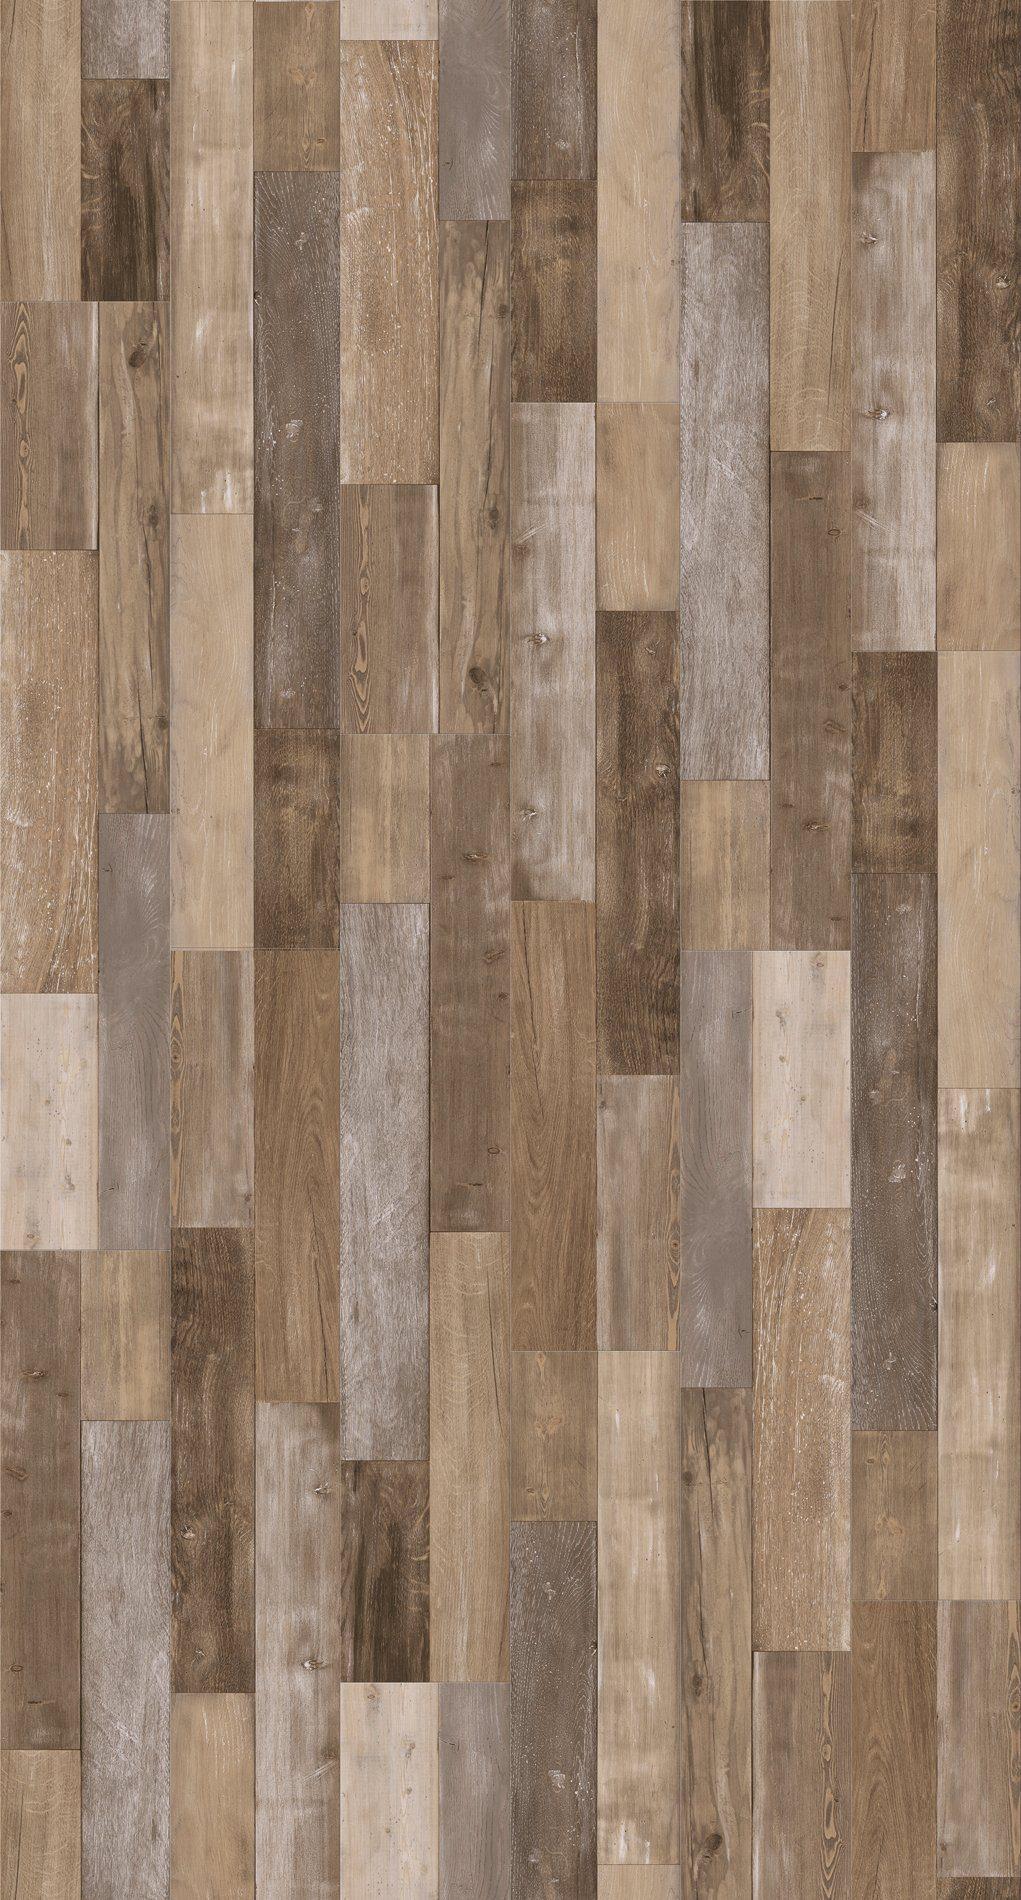 PARADOR Packung: Vinylboden »Classic 2030 - Shufflewood wild«, 1218 x 216 x 8,6 mm, 1,8 m²